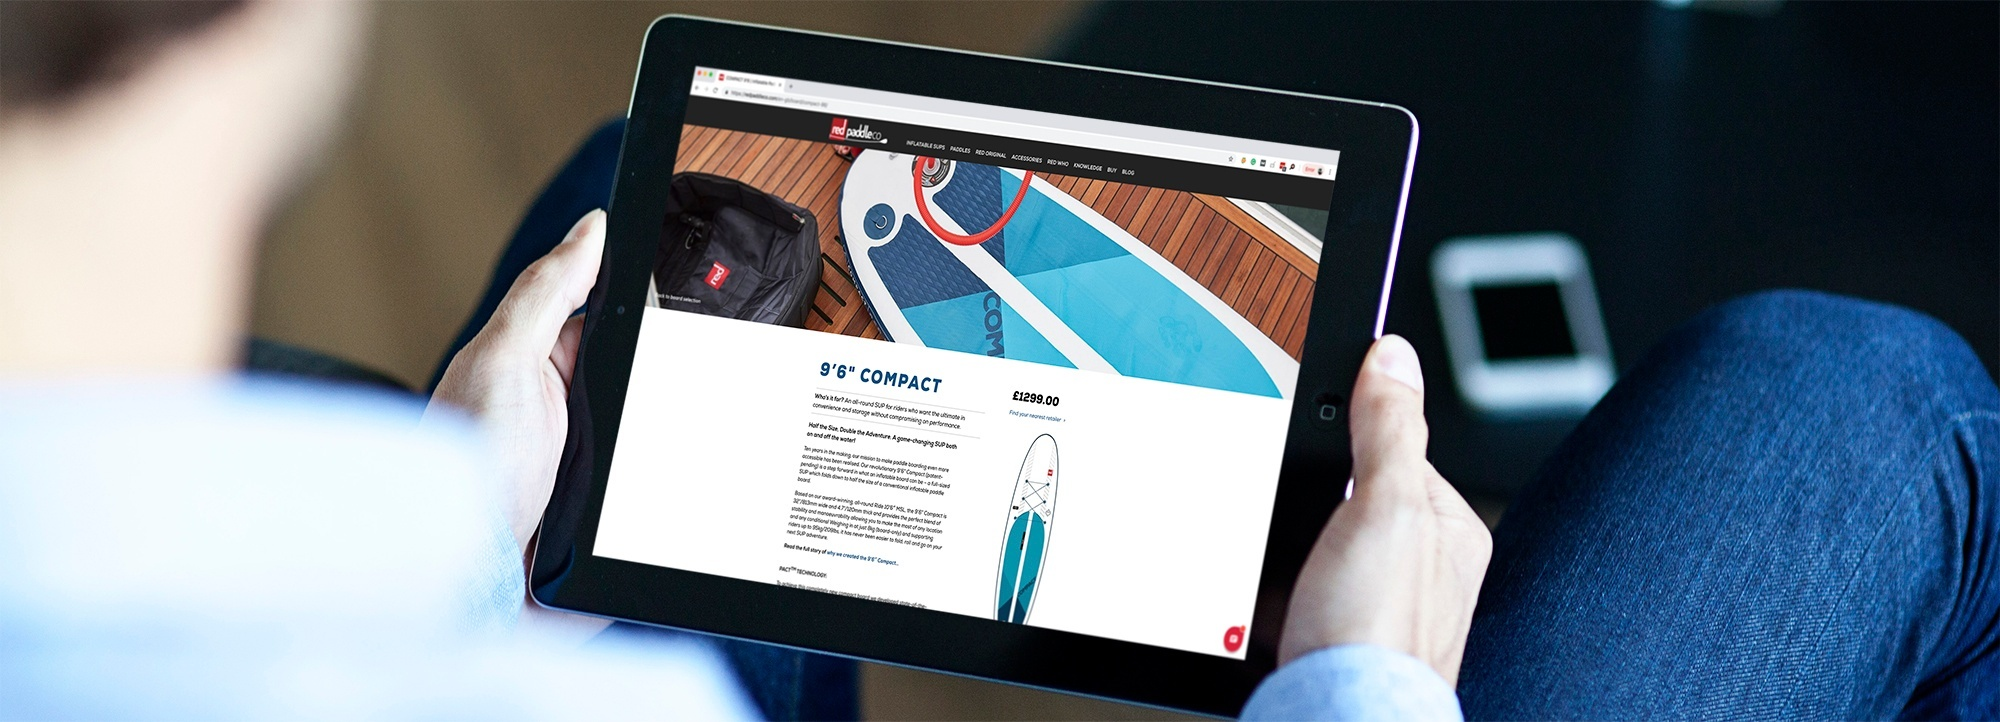 red-paddle-co-ecommerce-website-ipad-1.jpg